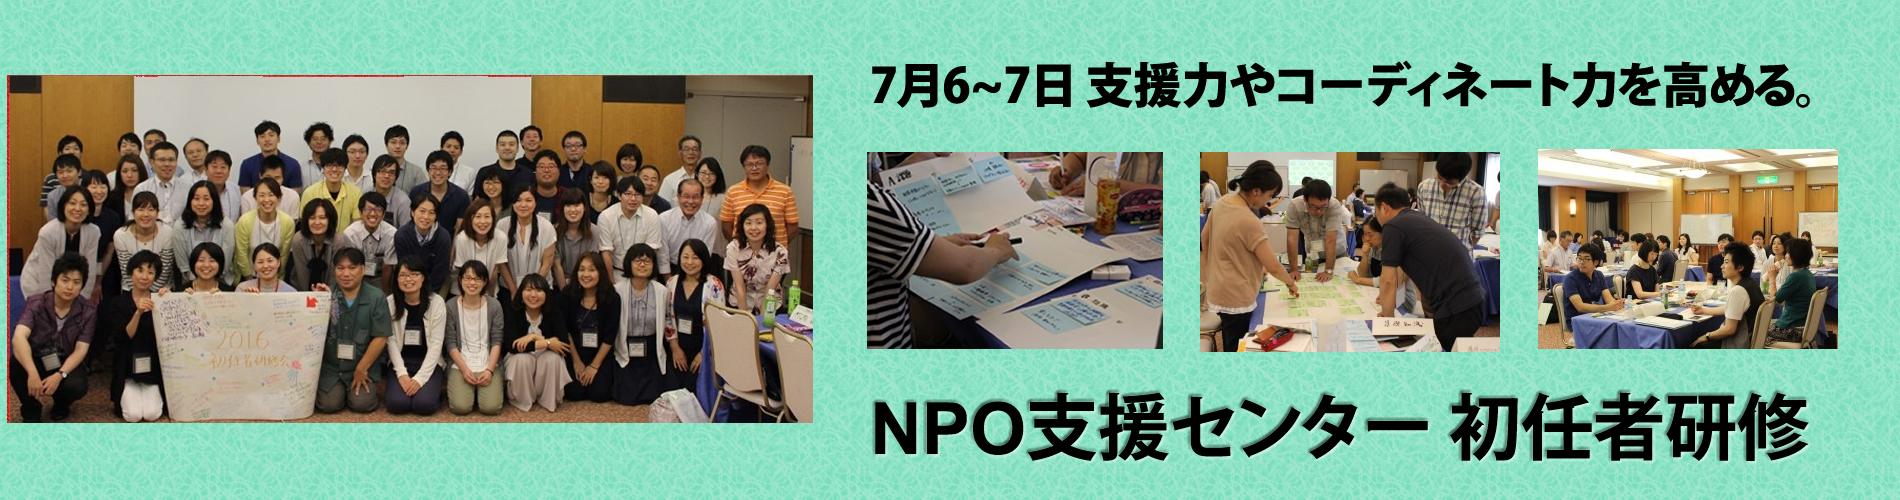 NPO支援センター初任者研修